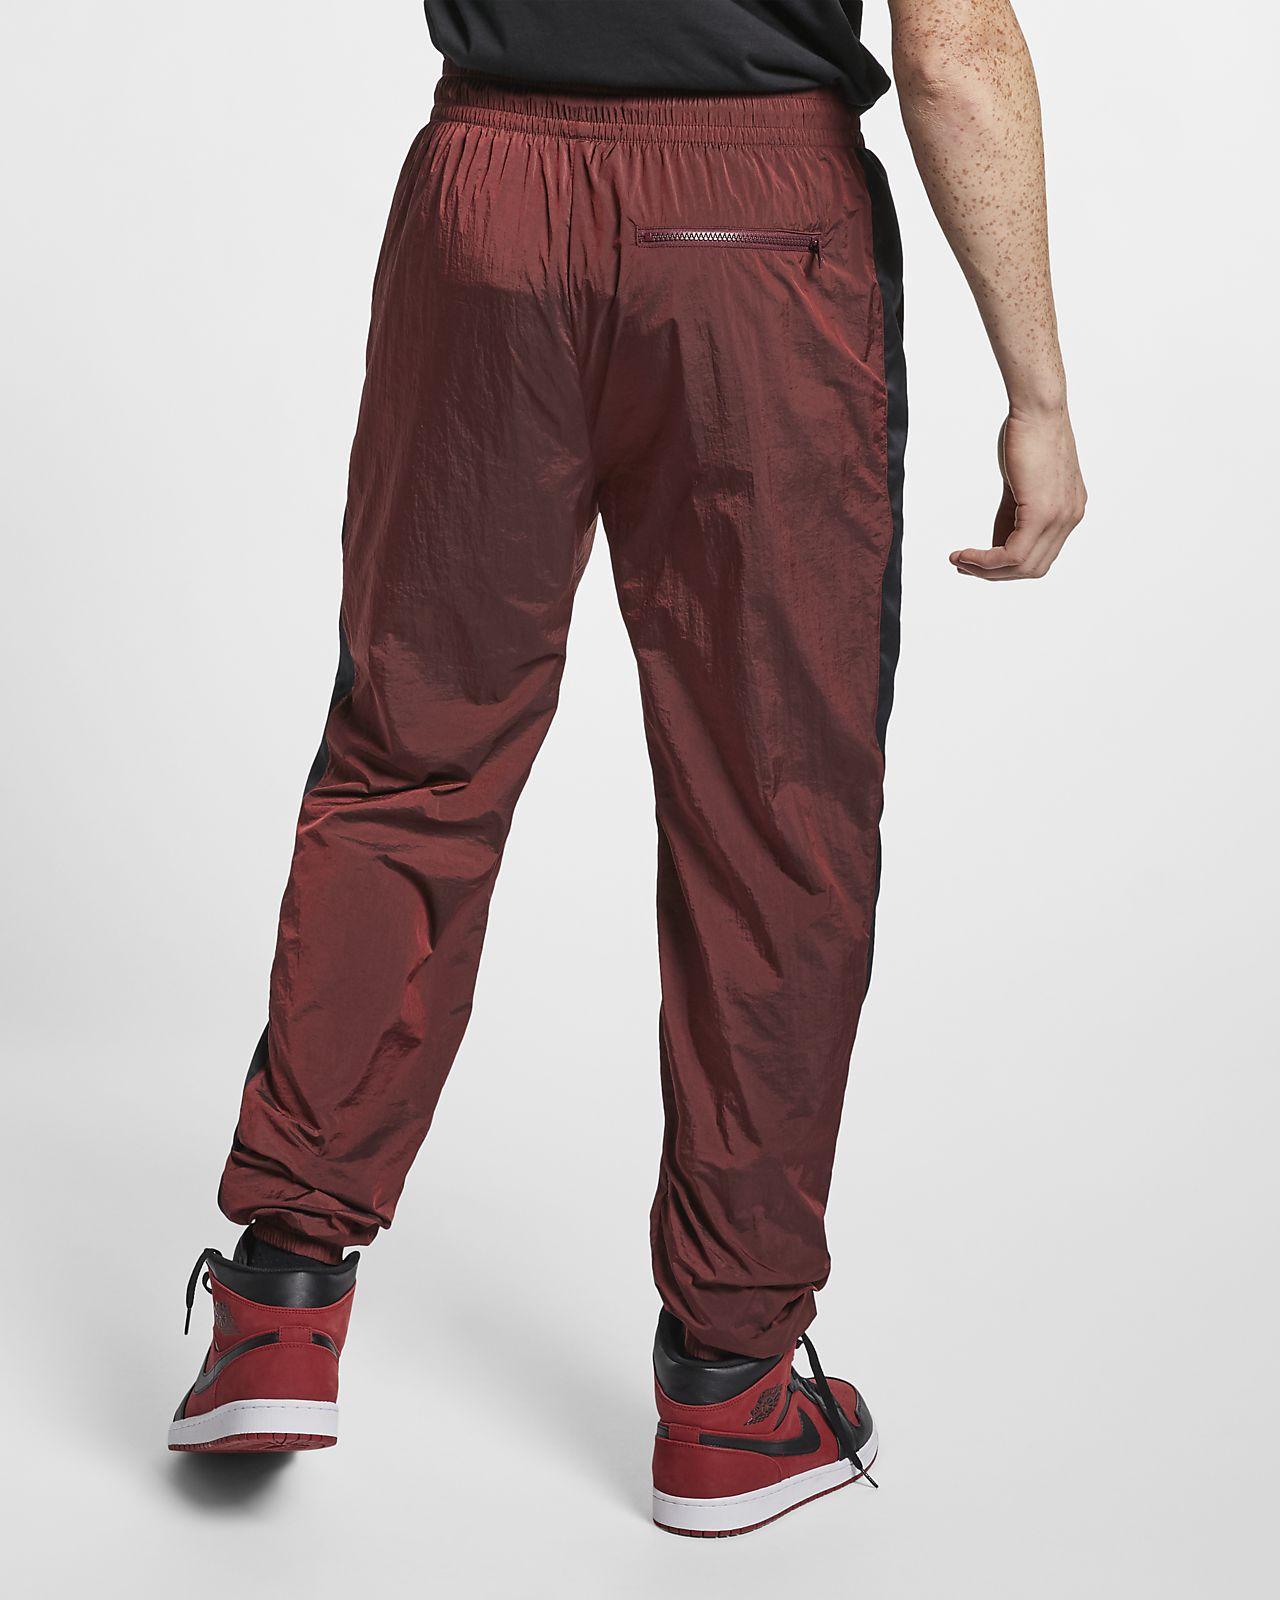 9e53fe99ce8449 Jordan Flight Warm-Up Trousers. Nike.com CH